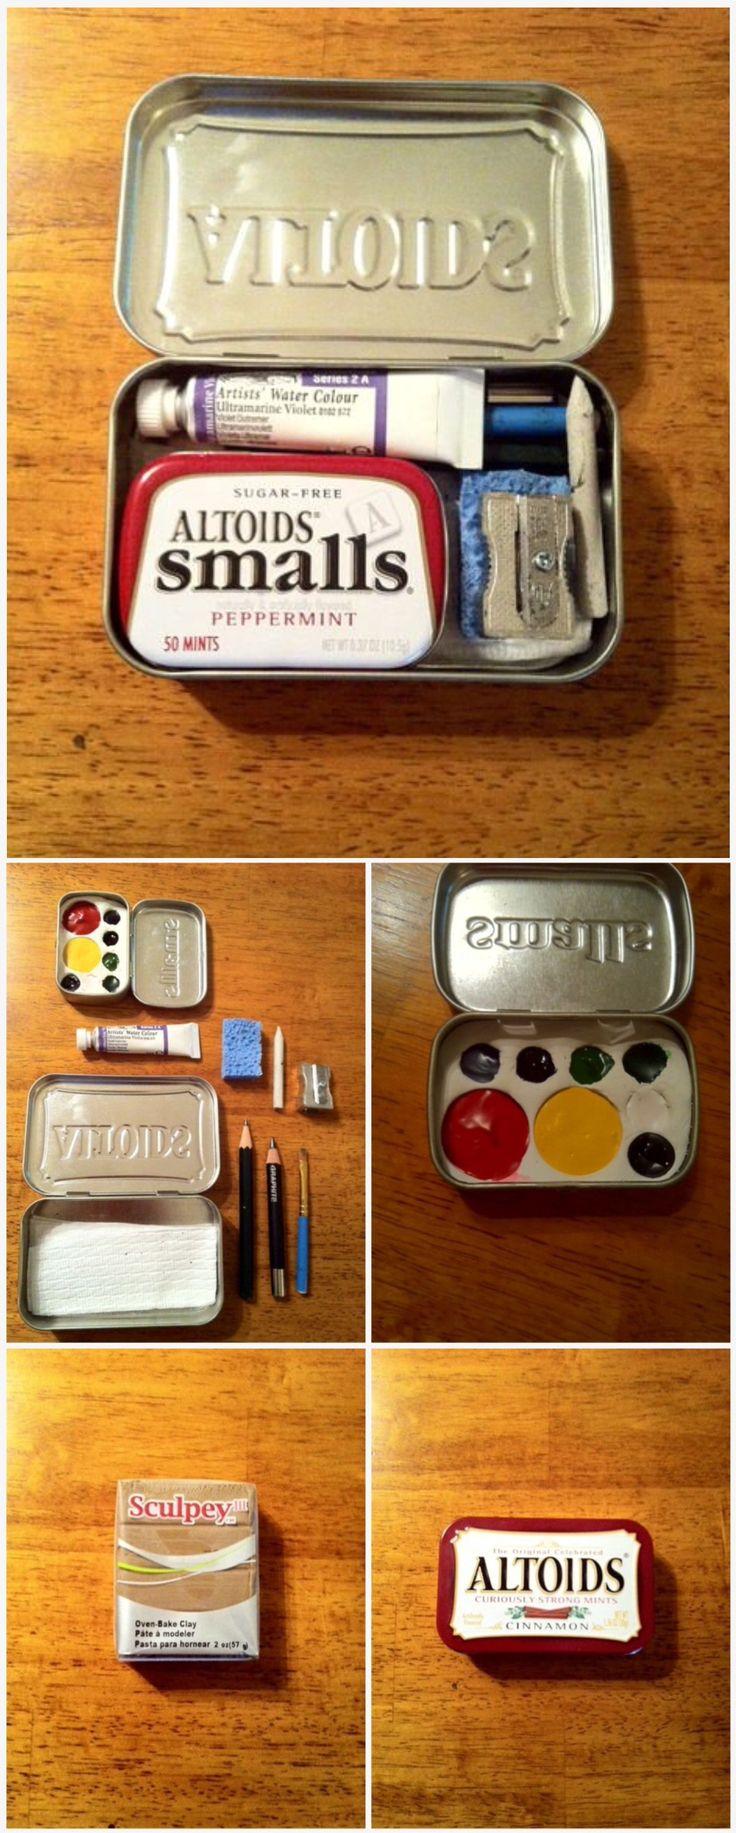 'Pocket-sized Watercolor Altoids Tin...!' (via Instructables.com)